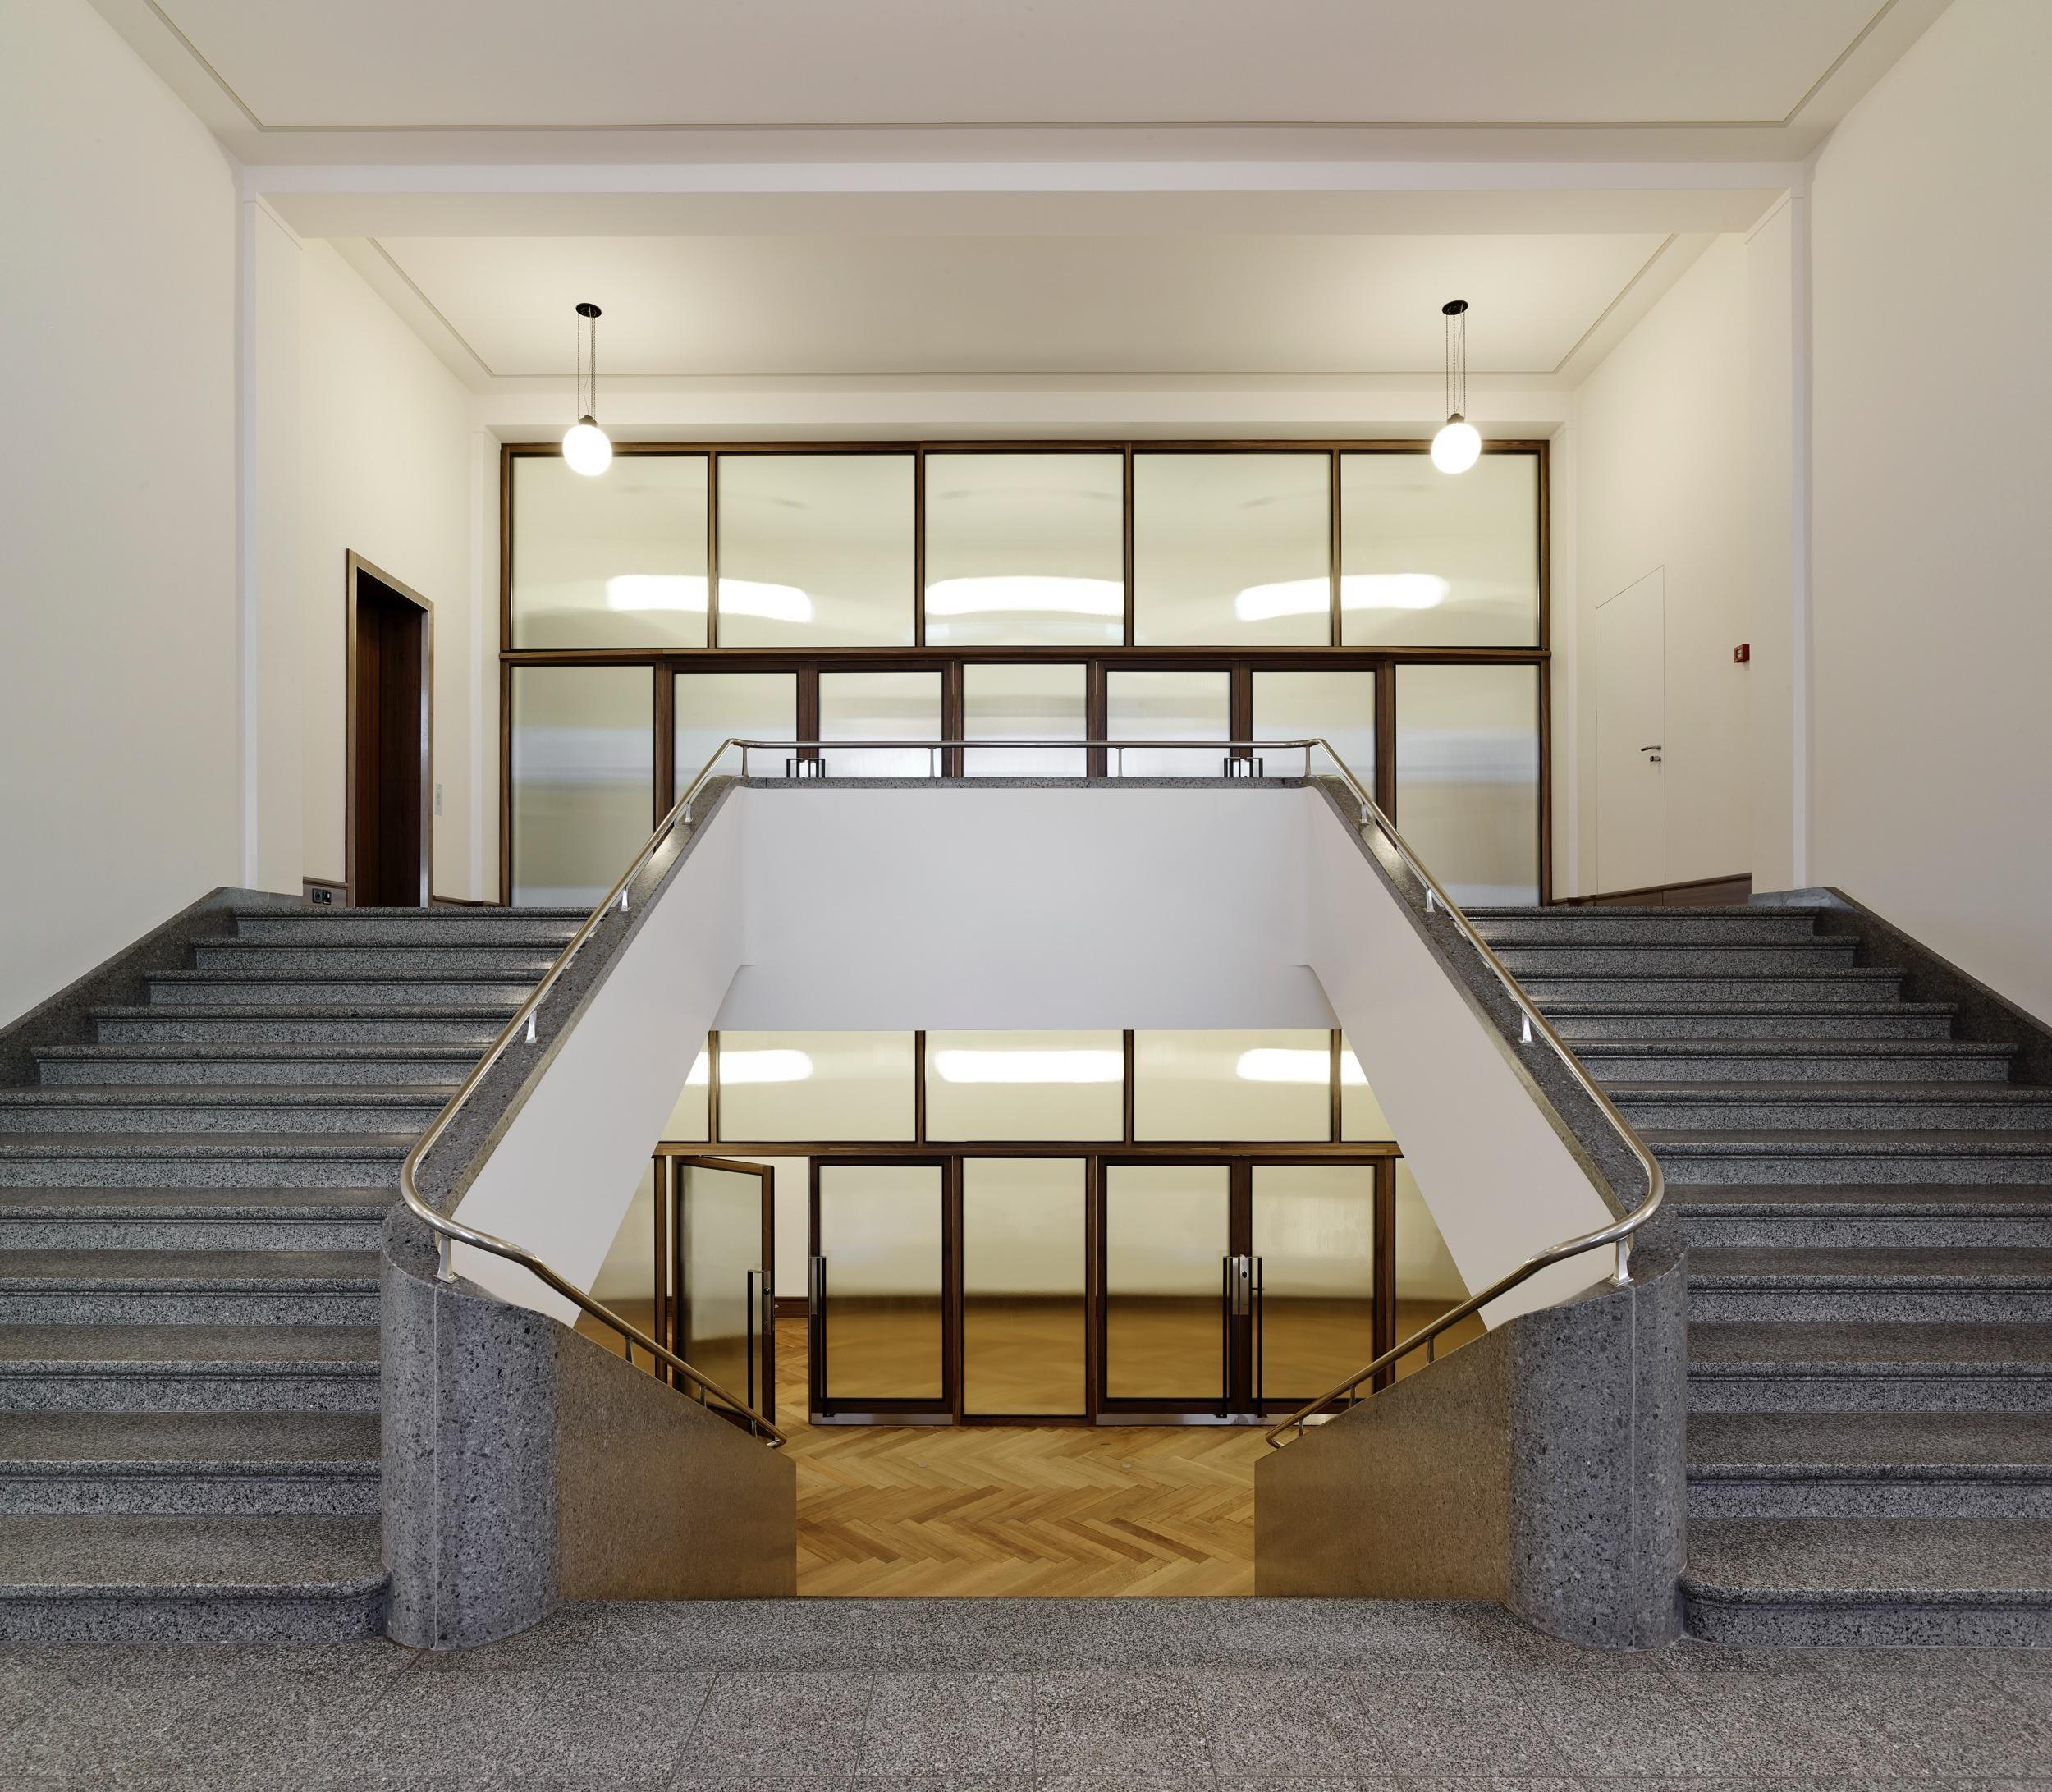 Fenstertuere_Framestar_Regierungsgebaeude_Frauenfeld_001